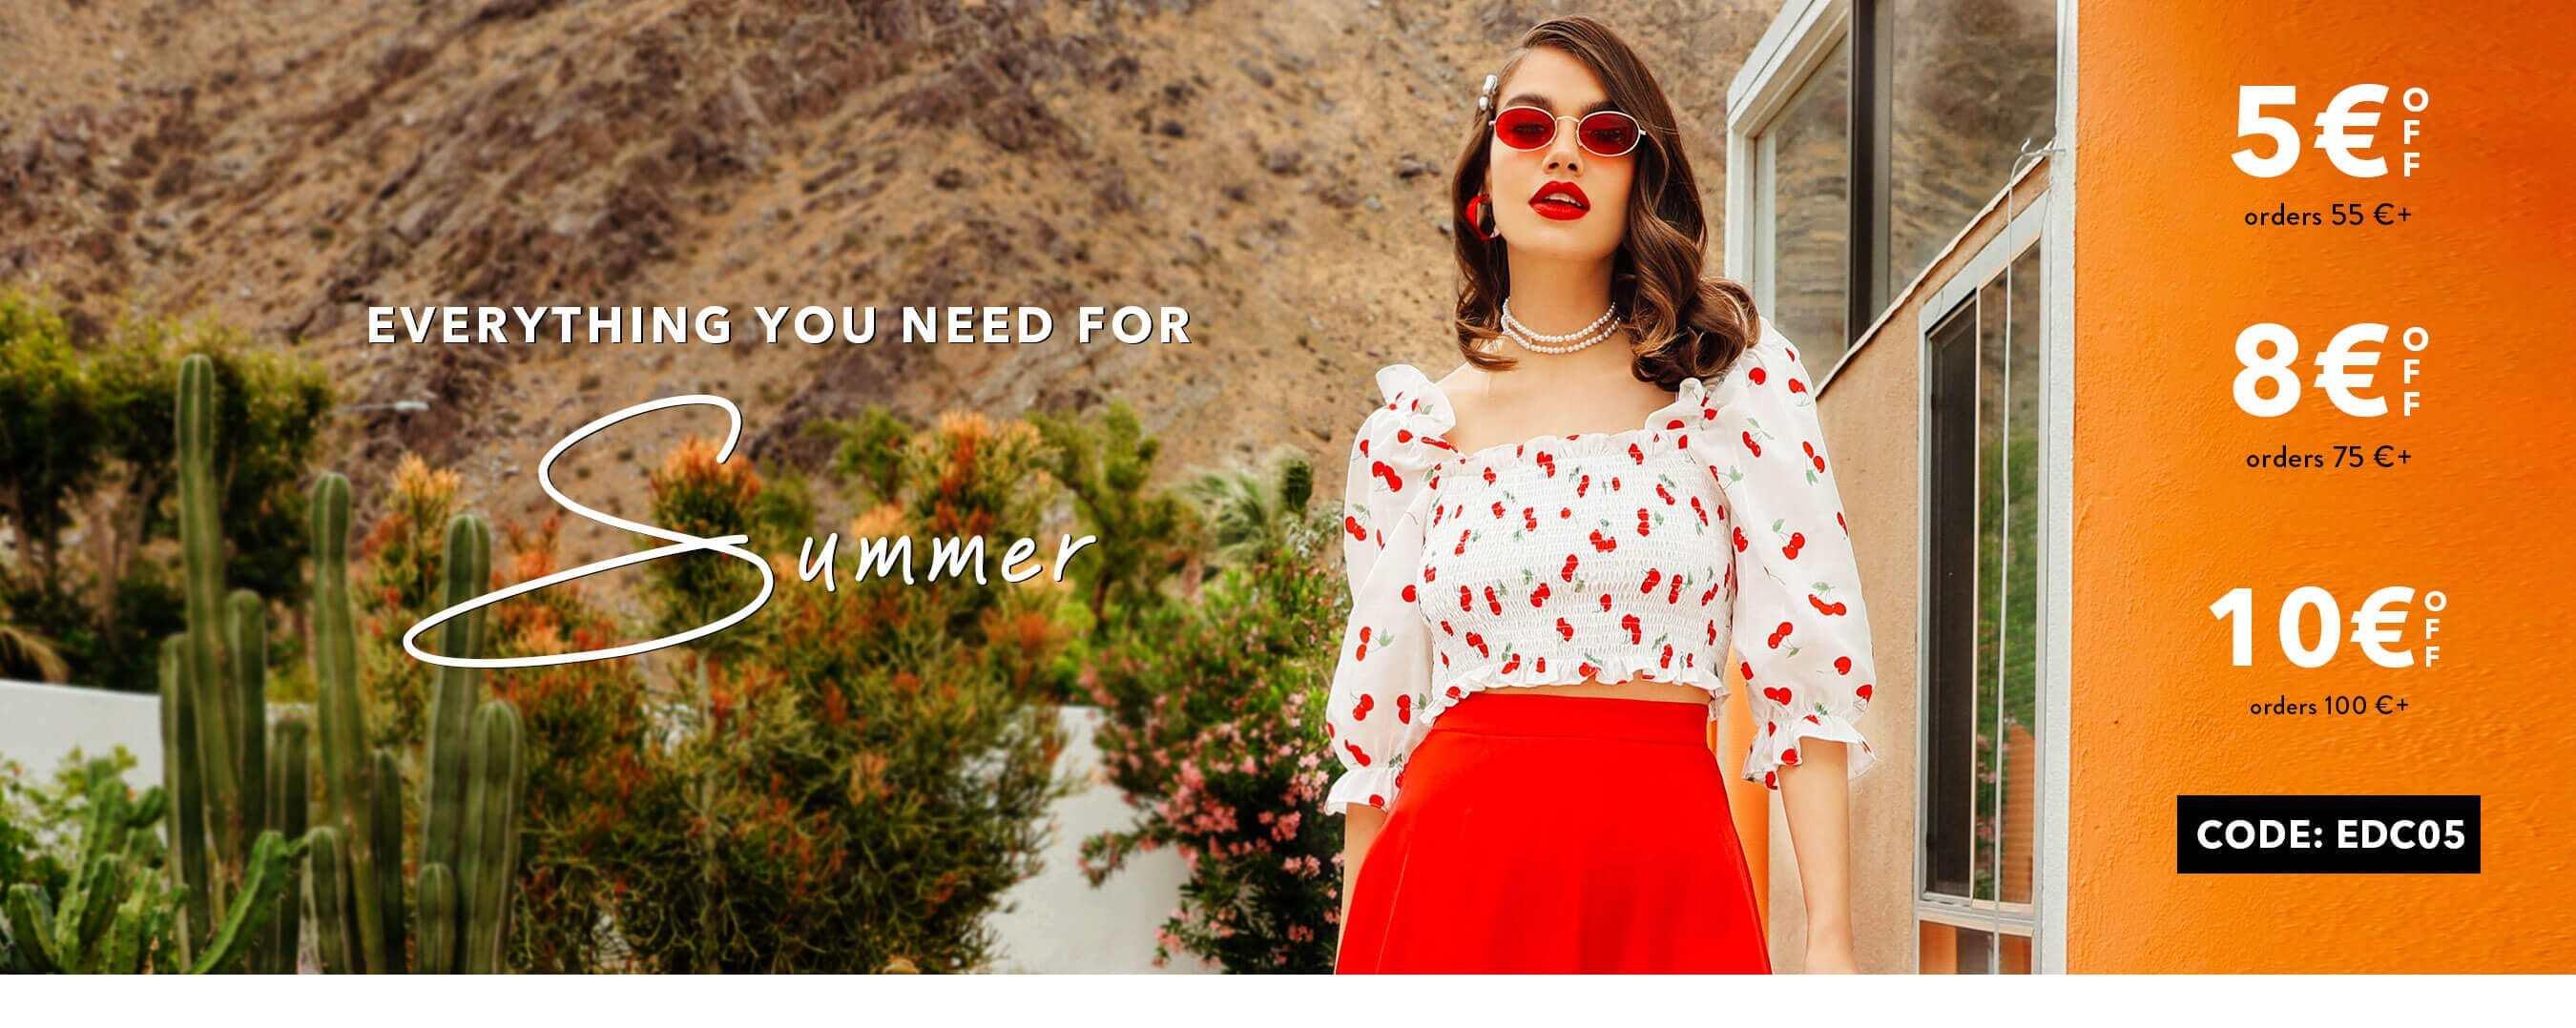 c88809da7abe SHEIN | Women's Clothing | Shop Clothes & Fashion